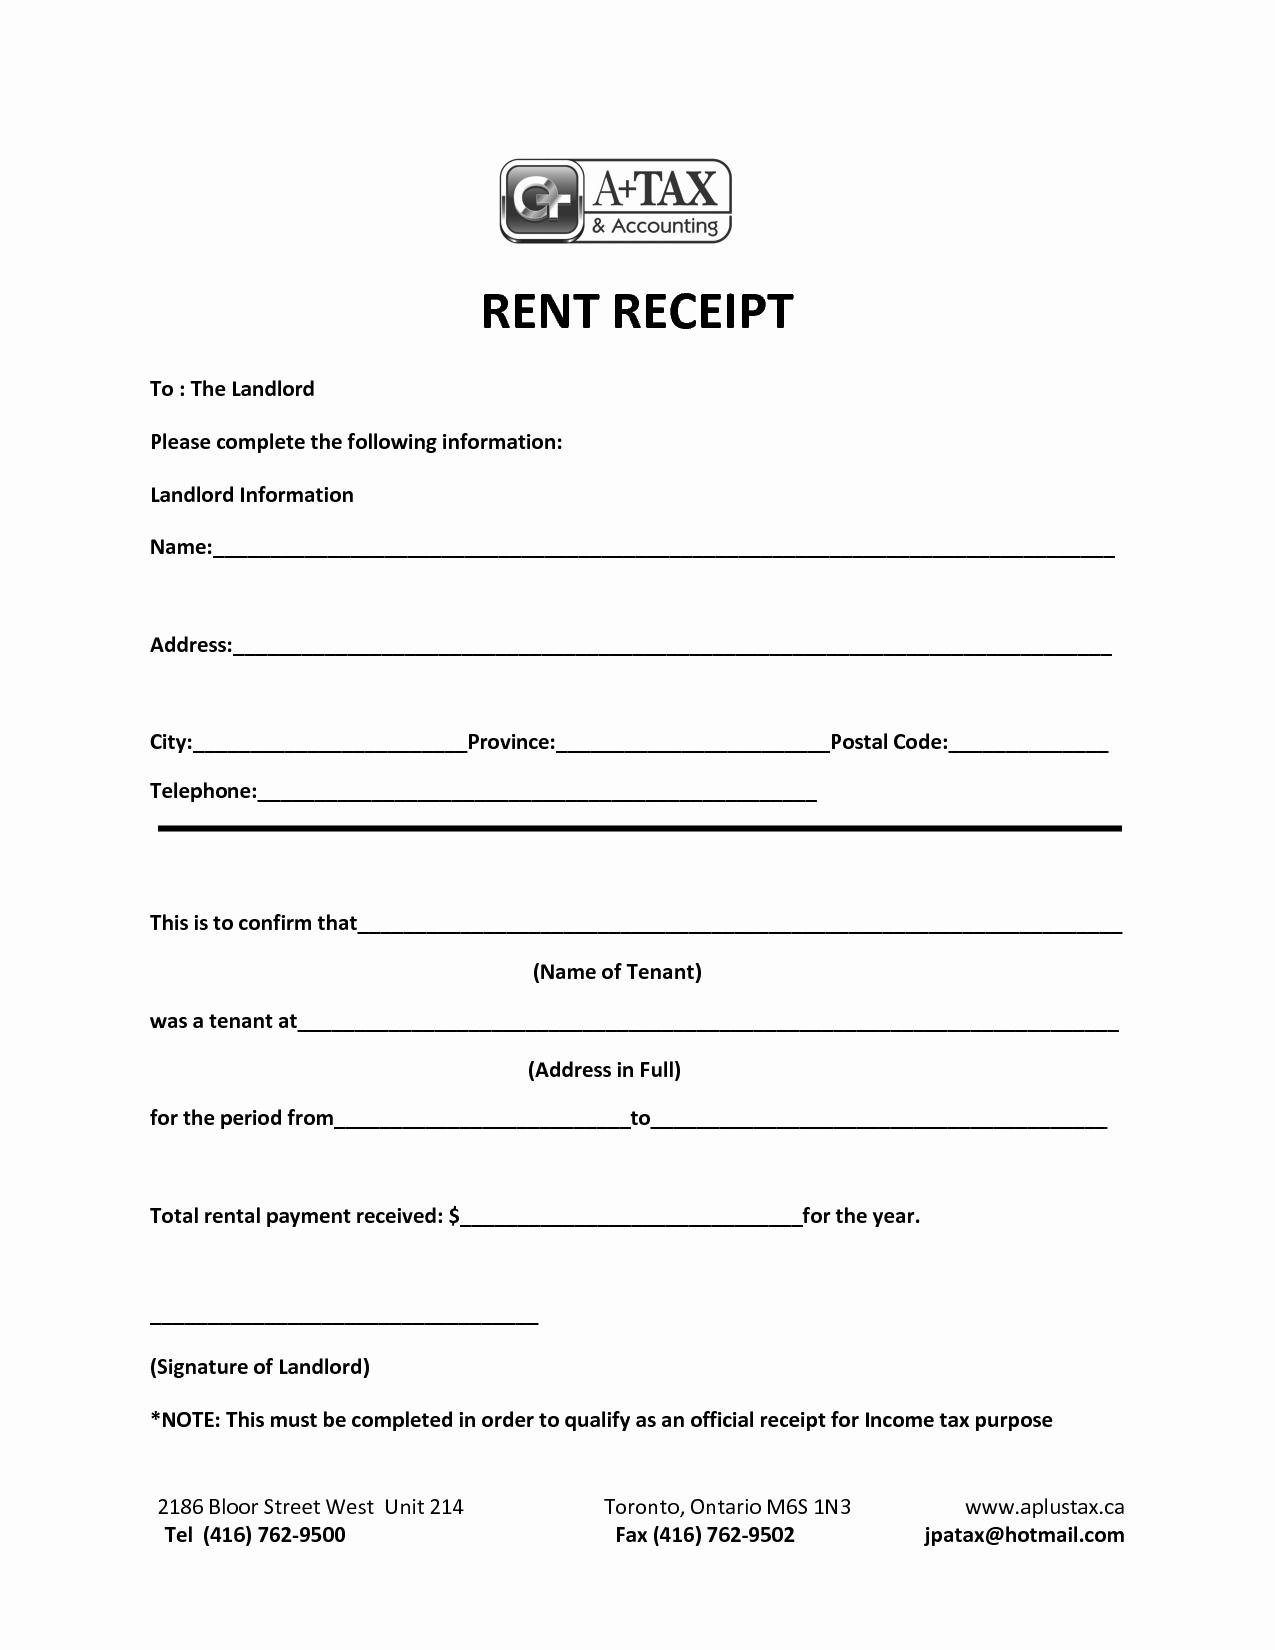 Fake Credit Report Template Elegant Free Rental Receipt Template Word – Rent Receipt